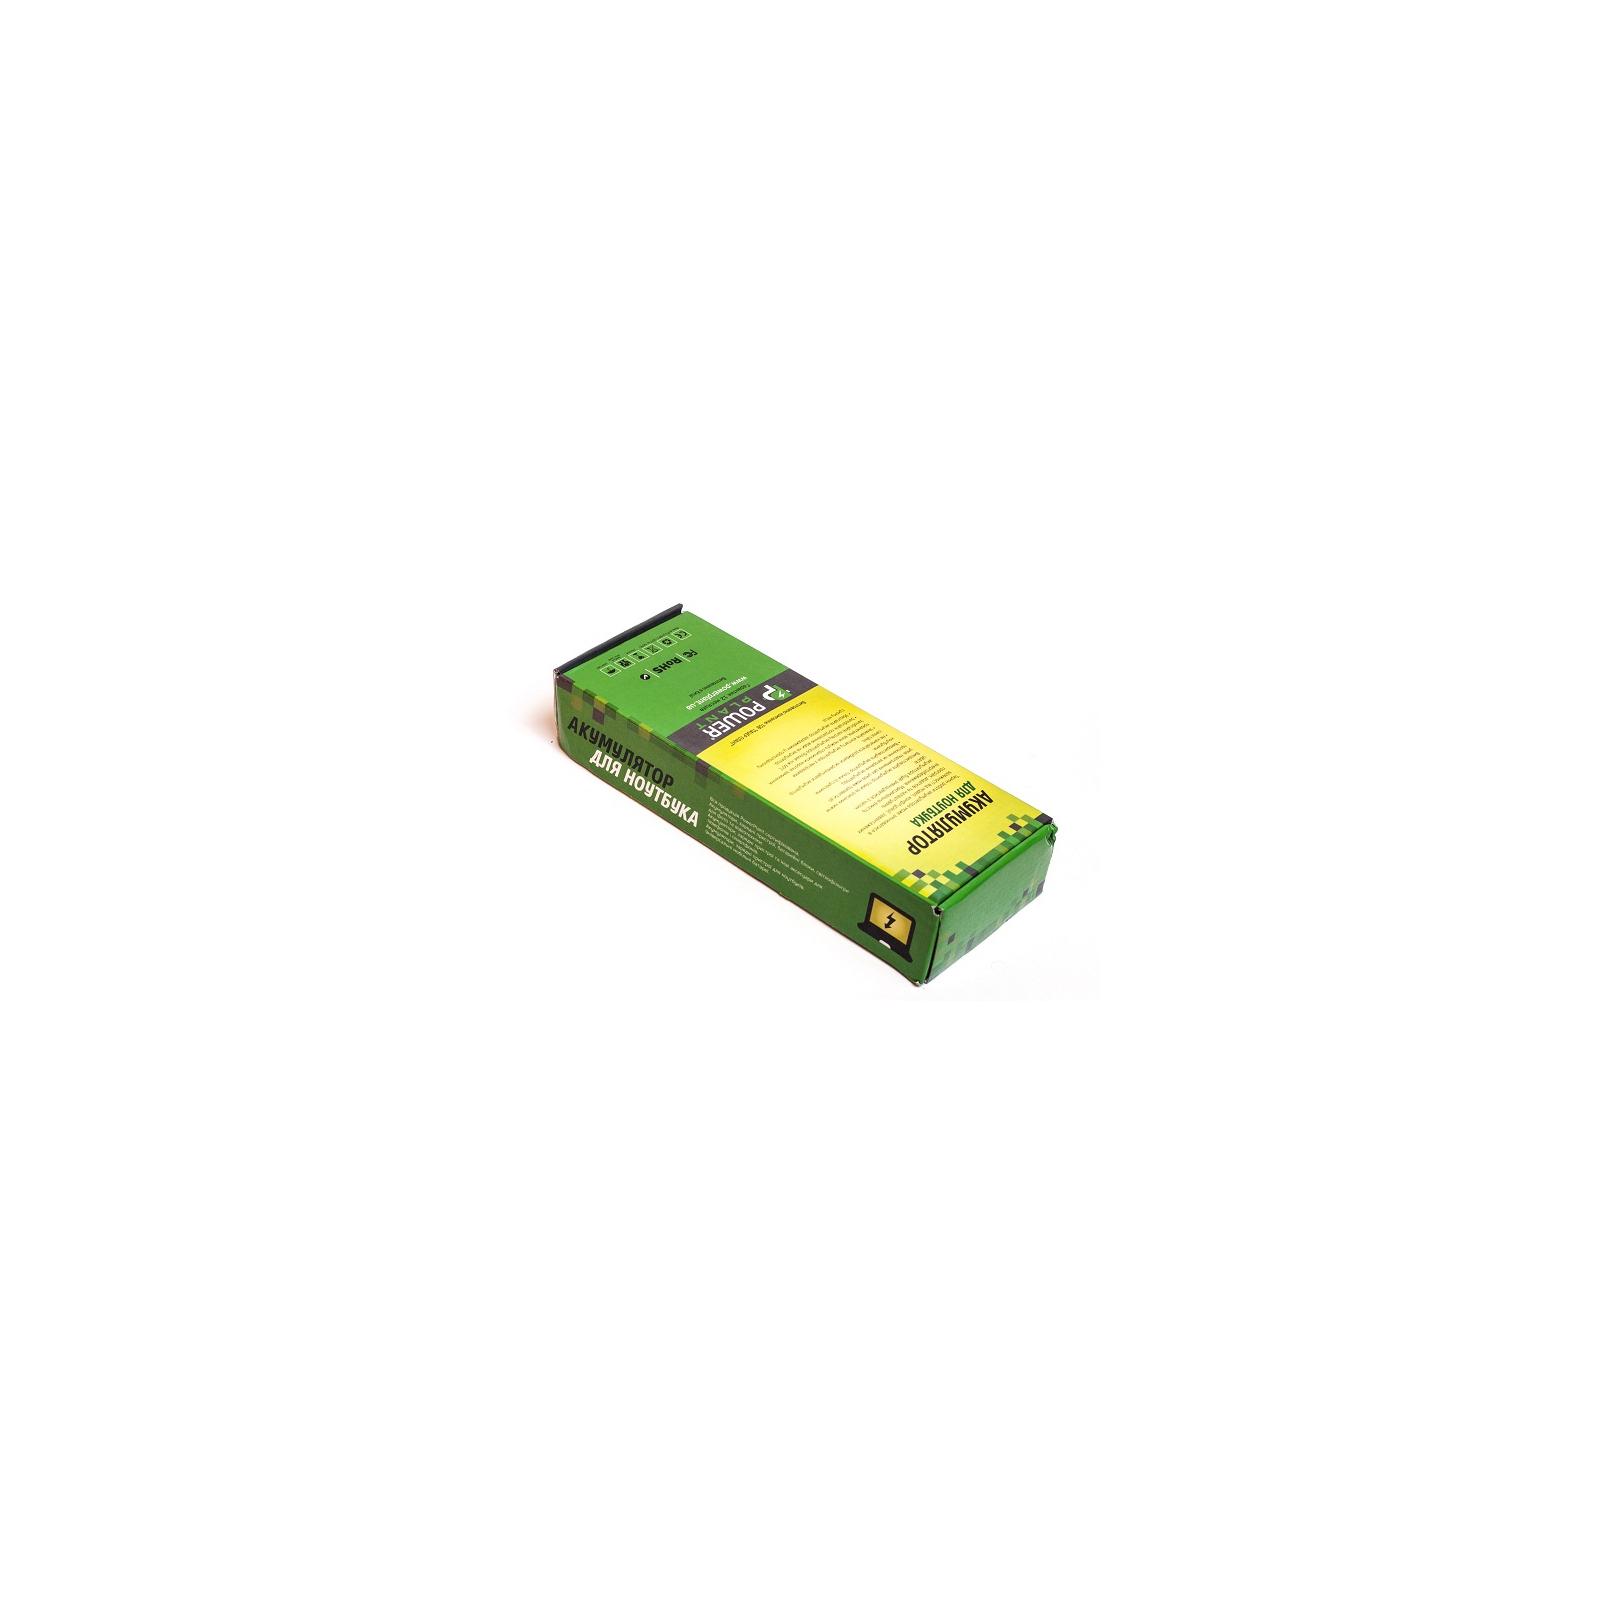 Аккумулятор для ноутбука ASUS EEE PC1005HA (AL32-1005, AS1005LH) 11.1V 5200mAh PowerPlant (NB00000102) изображение 2